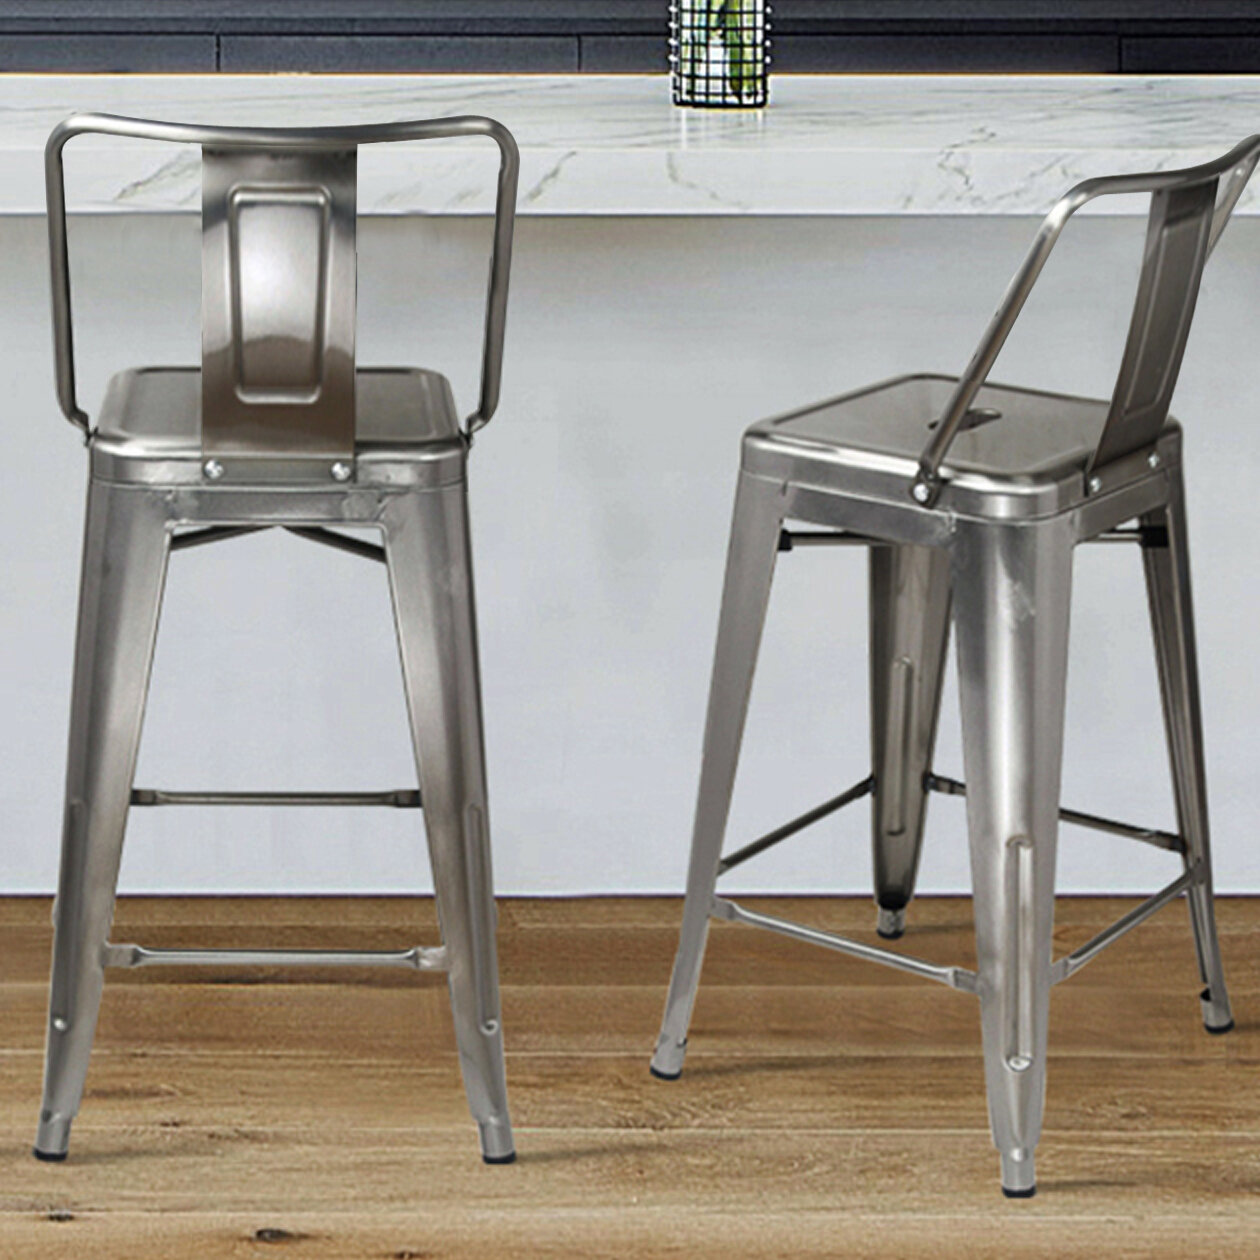 Set of 4 Metal Steel 24/'/' Bar Stool High Counter Top Barstool Silver Seat Stools